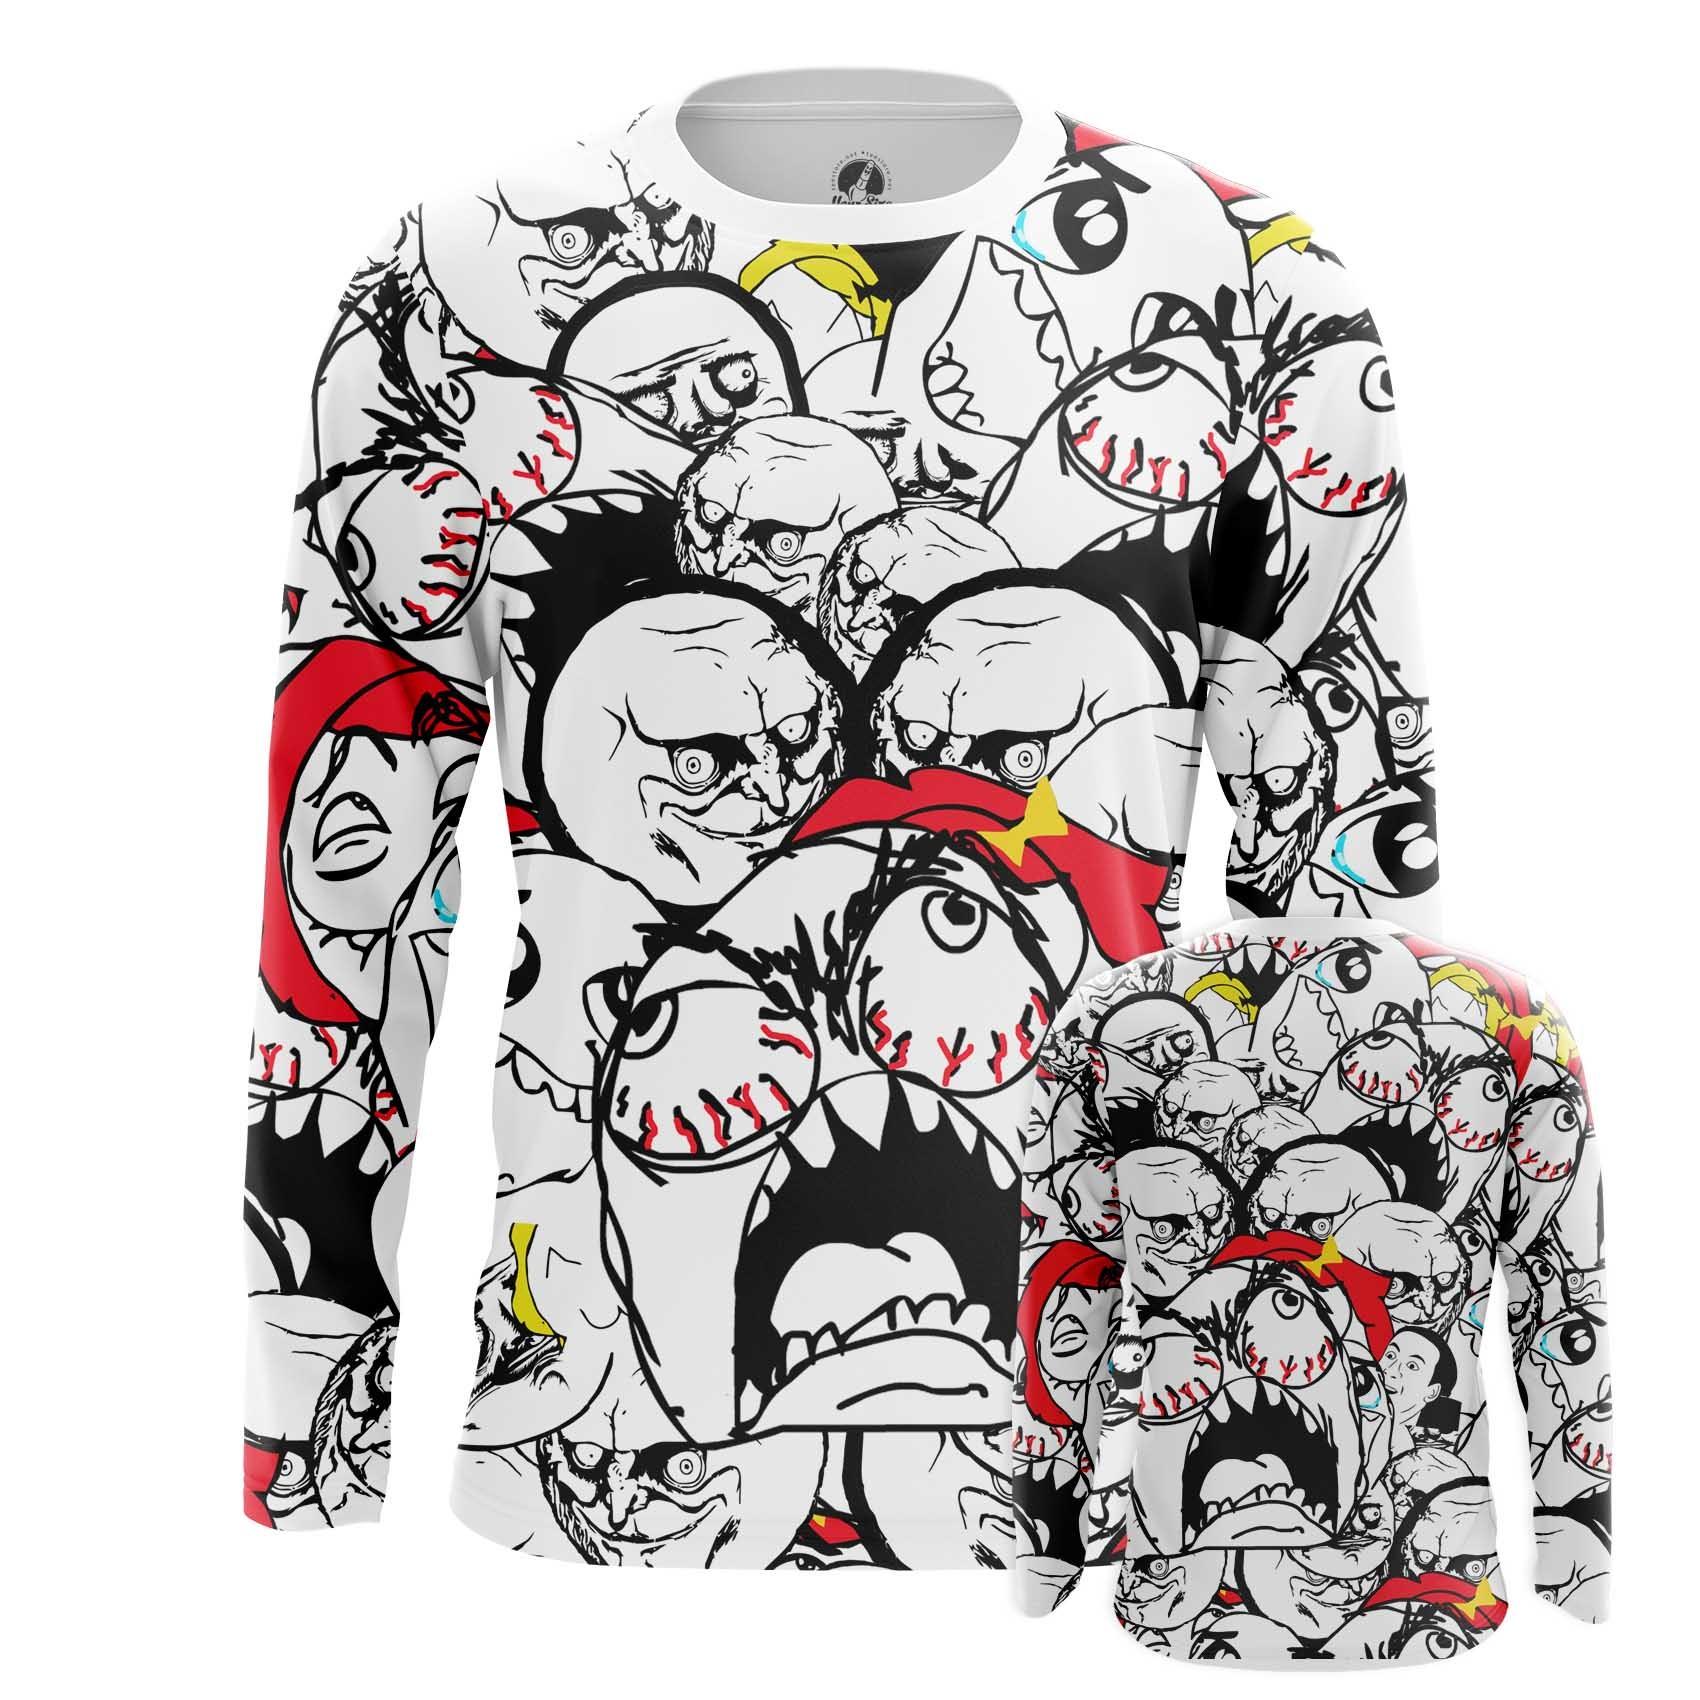 Merch Men'S T-Shirt Memes Internet Web Art Fun Faces